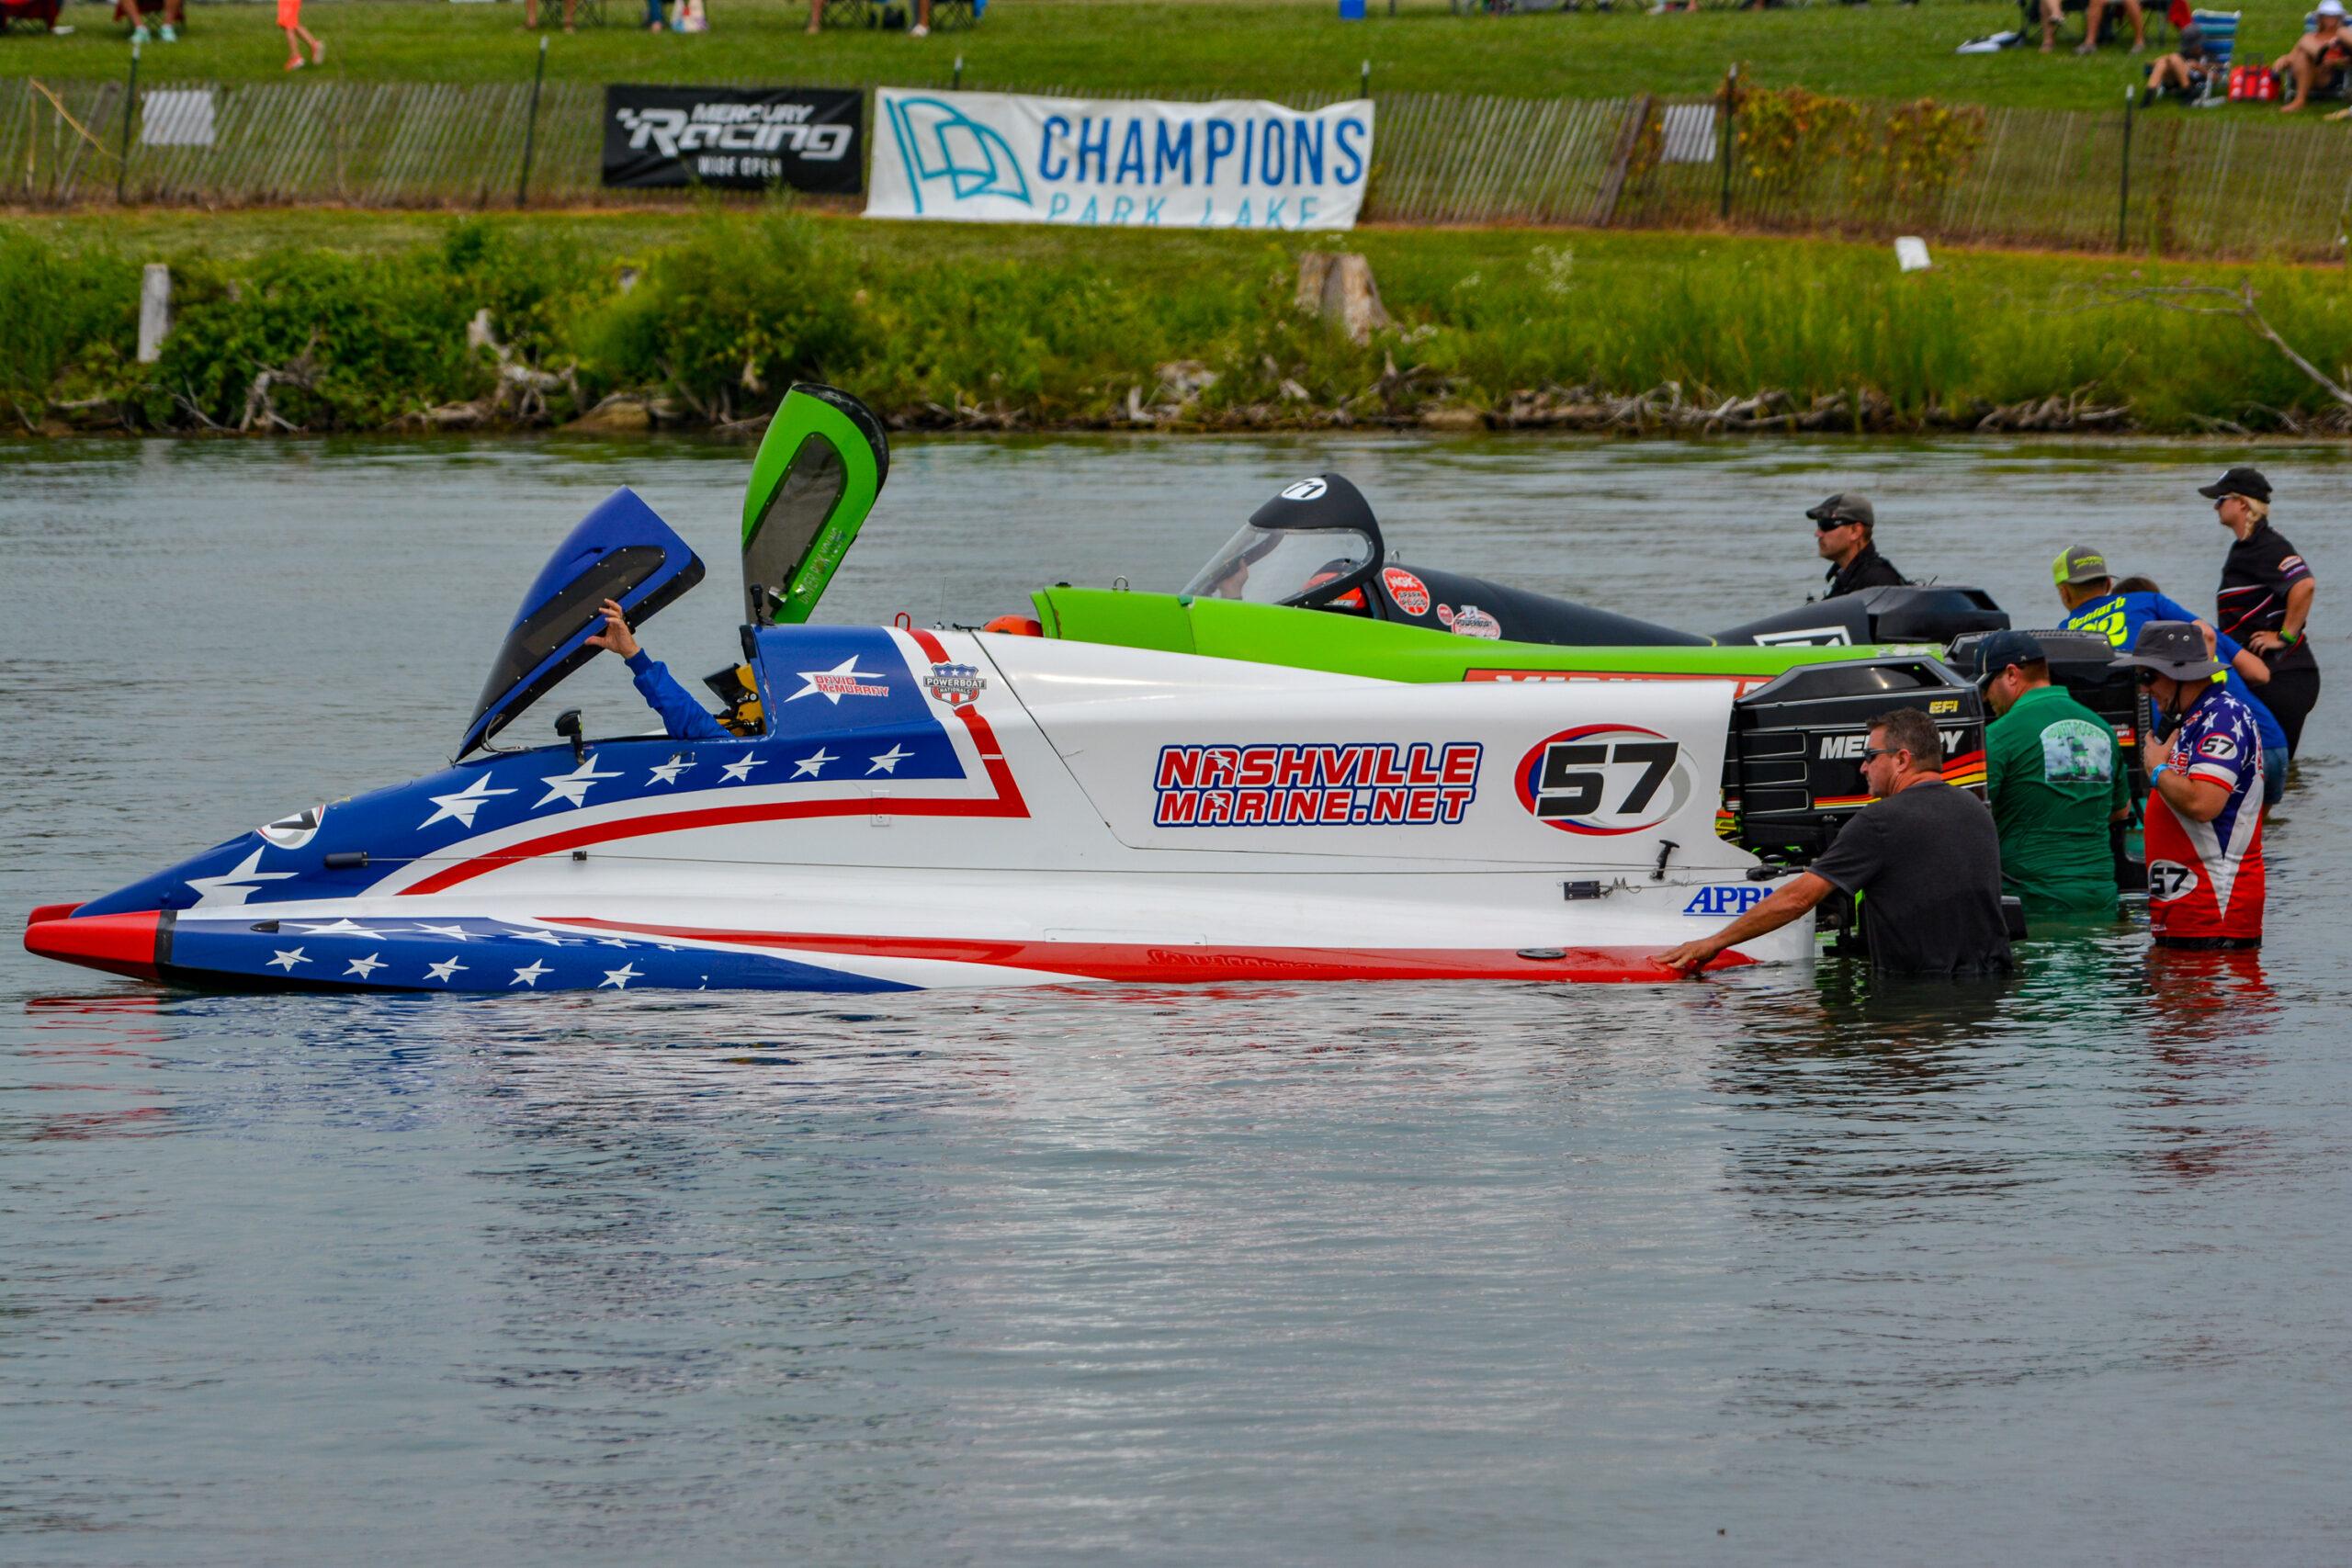 McMurray Racing Nashville Marine 2021 Springfield F1 Race-25